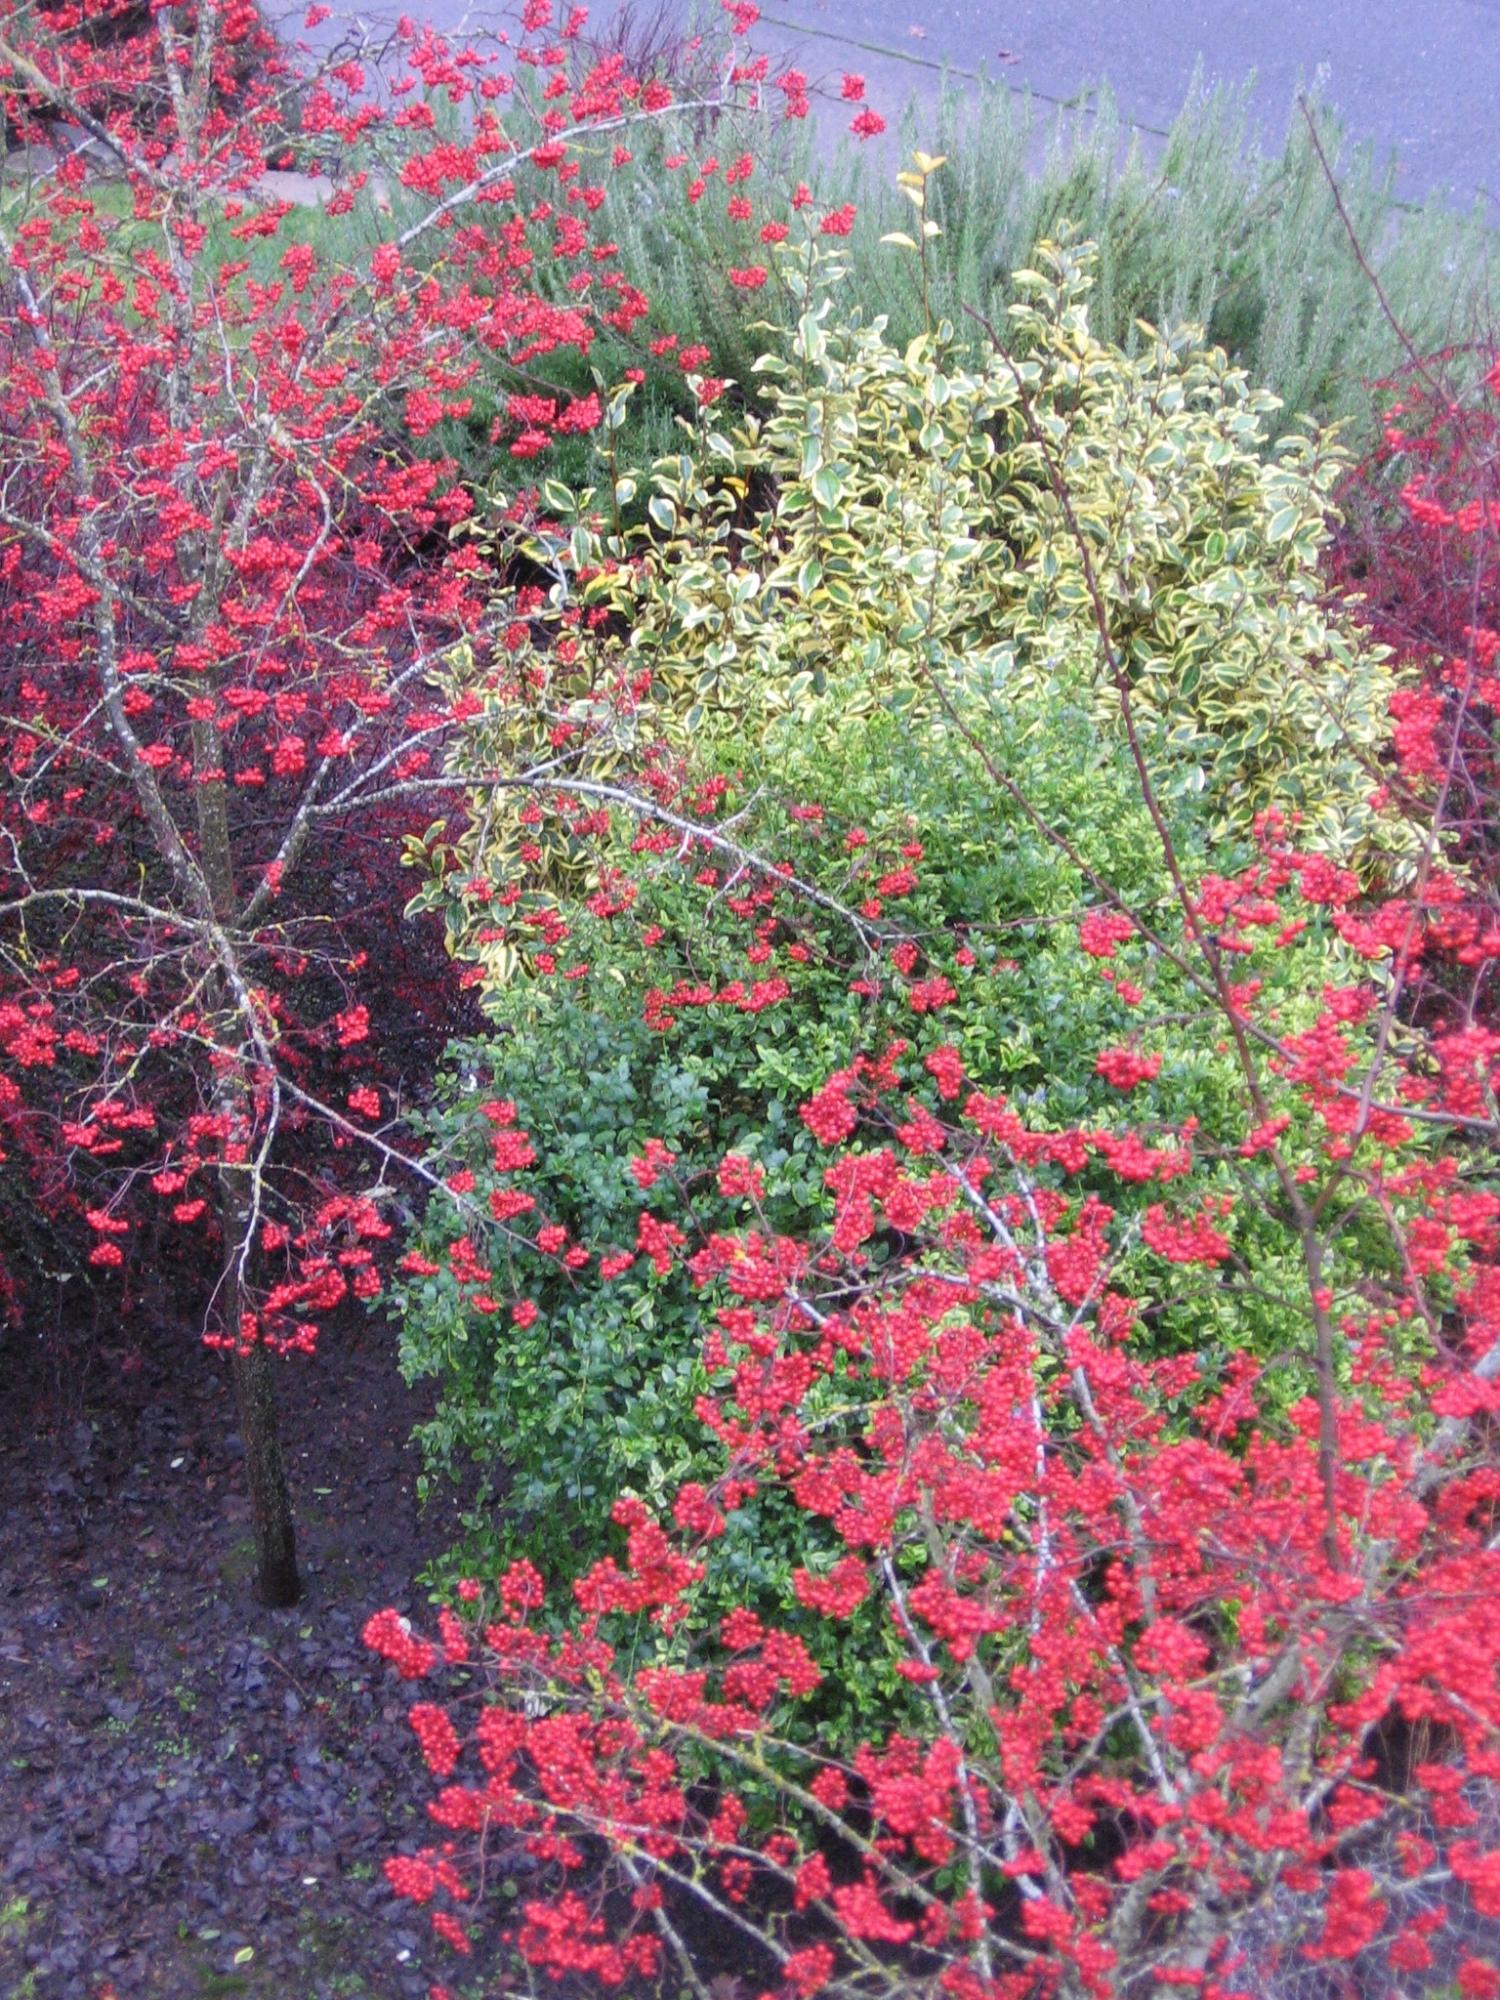 Red berries of  Crataegus phaenopyrum  (Washington Hawthorn). Planted here with yellow-and-green variegated evergreens  Ceanothus  'El Dorado' and  Elaeagnus ebbingei  'Gilt Edge'--a fantastic winter combination.